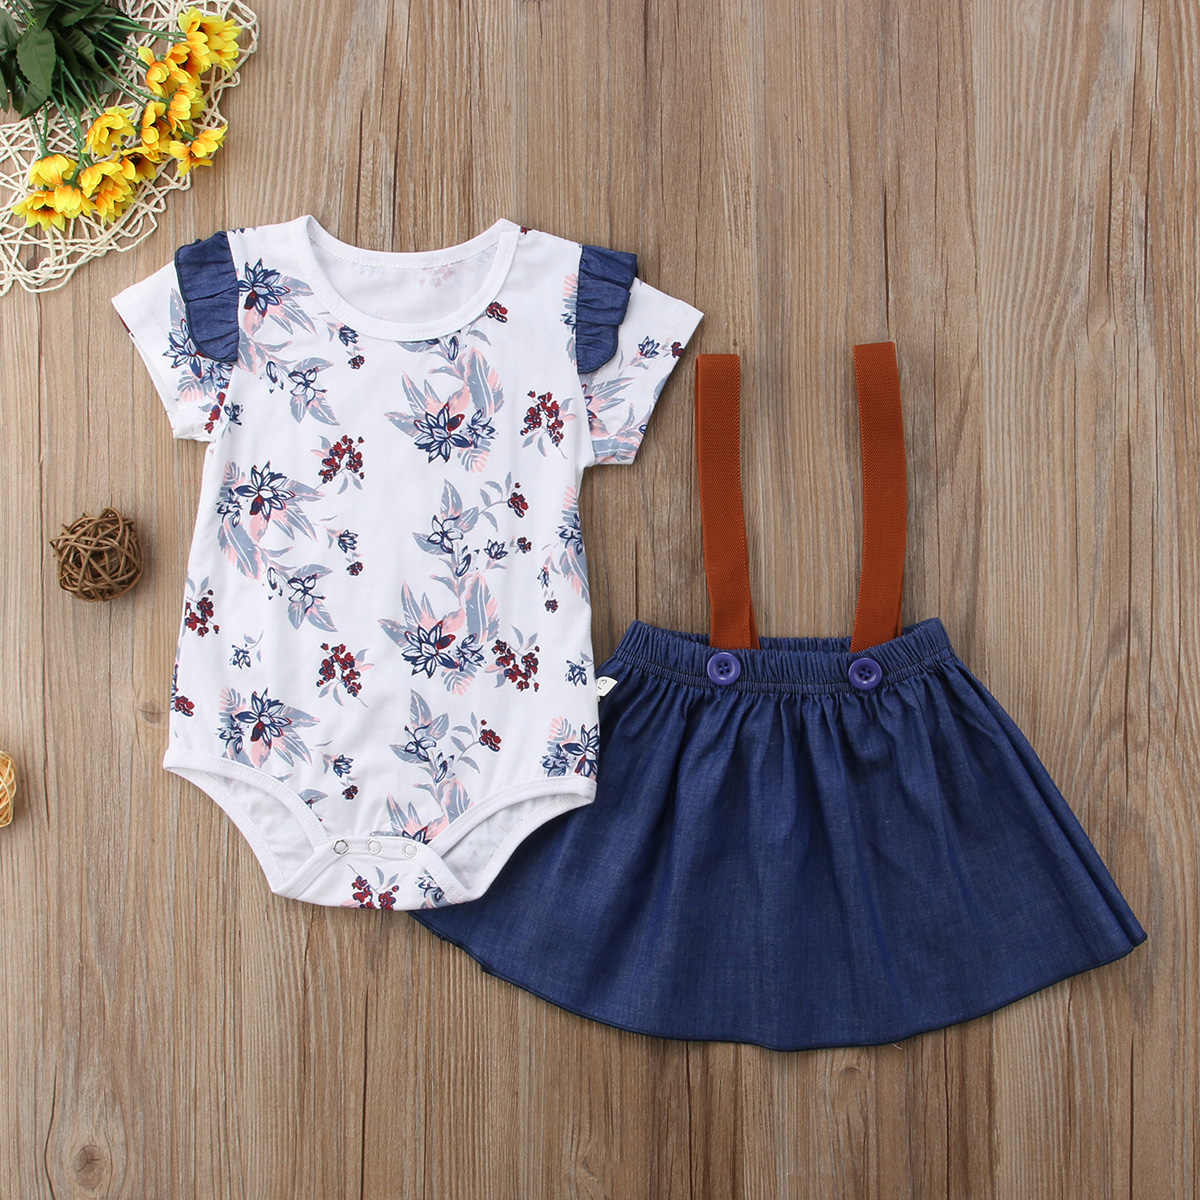 389f20b652fa ... 2018 Kids Baby Girl Floral Jumpsuit Short Sleeve Romper Prom Tutu Skirt  Dress Outfits Set 0 ...